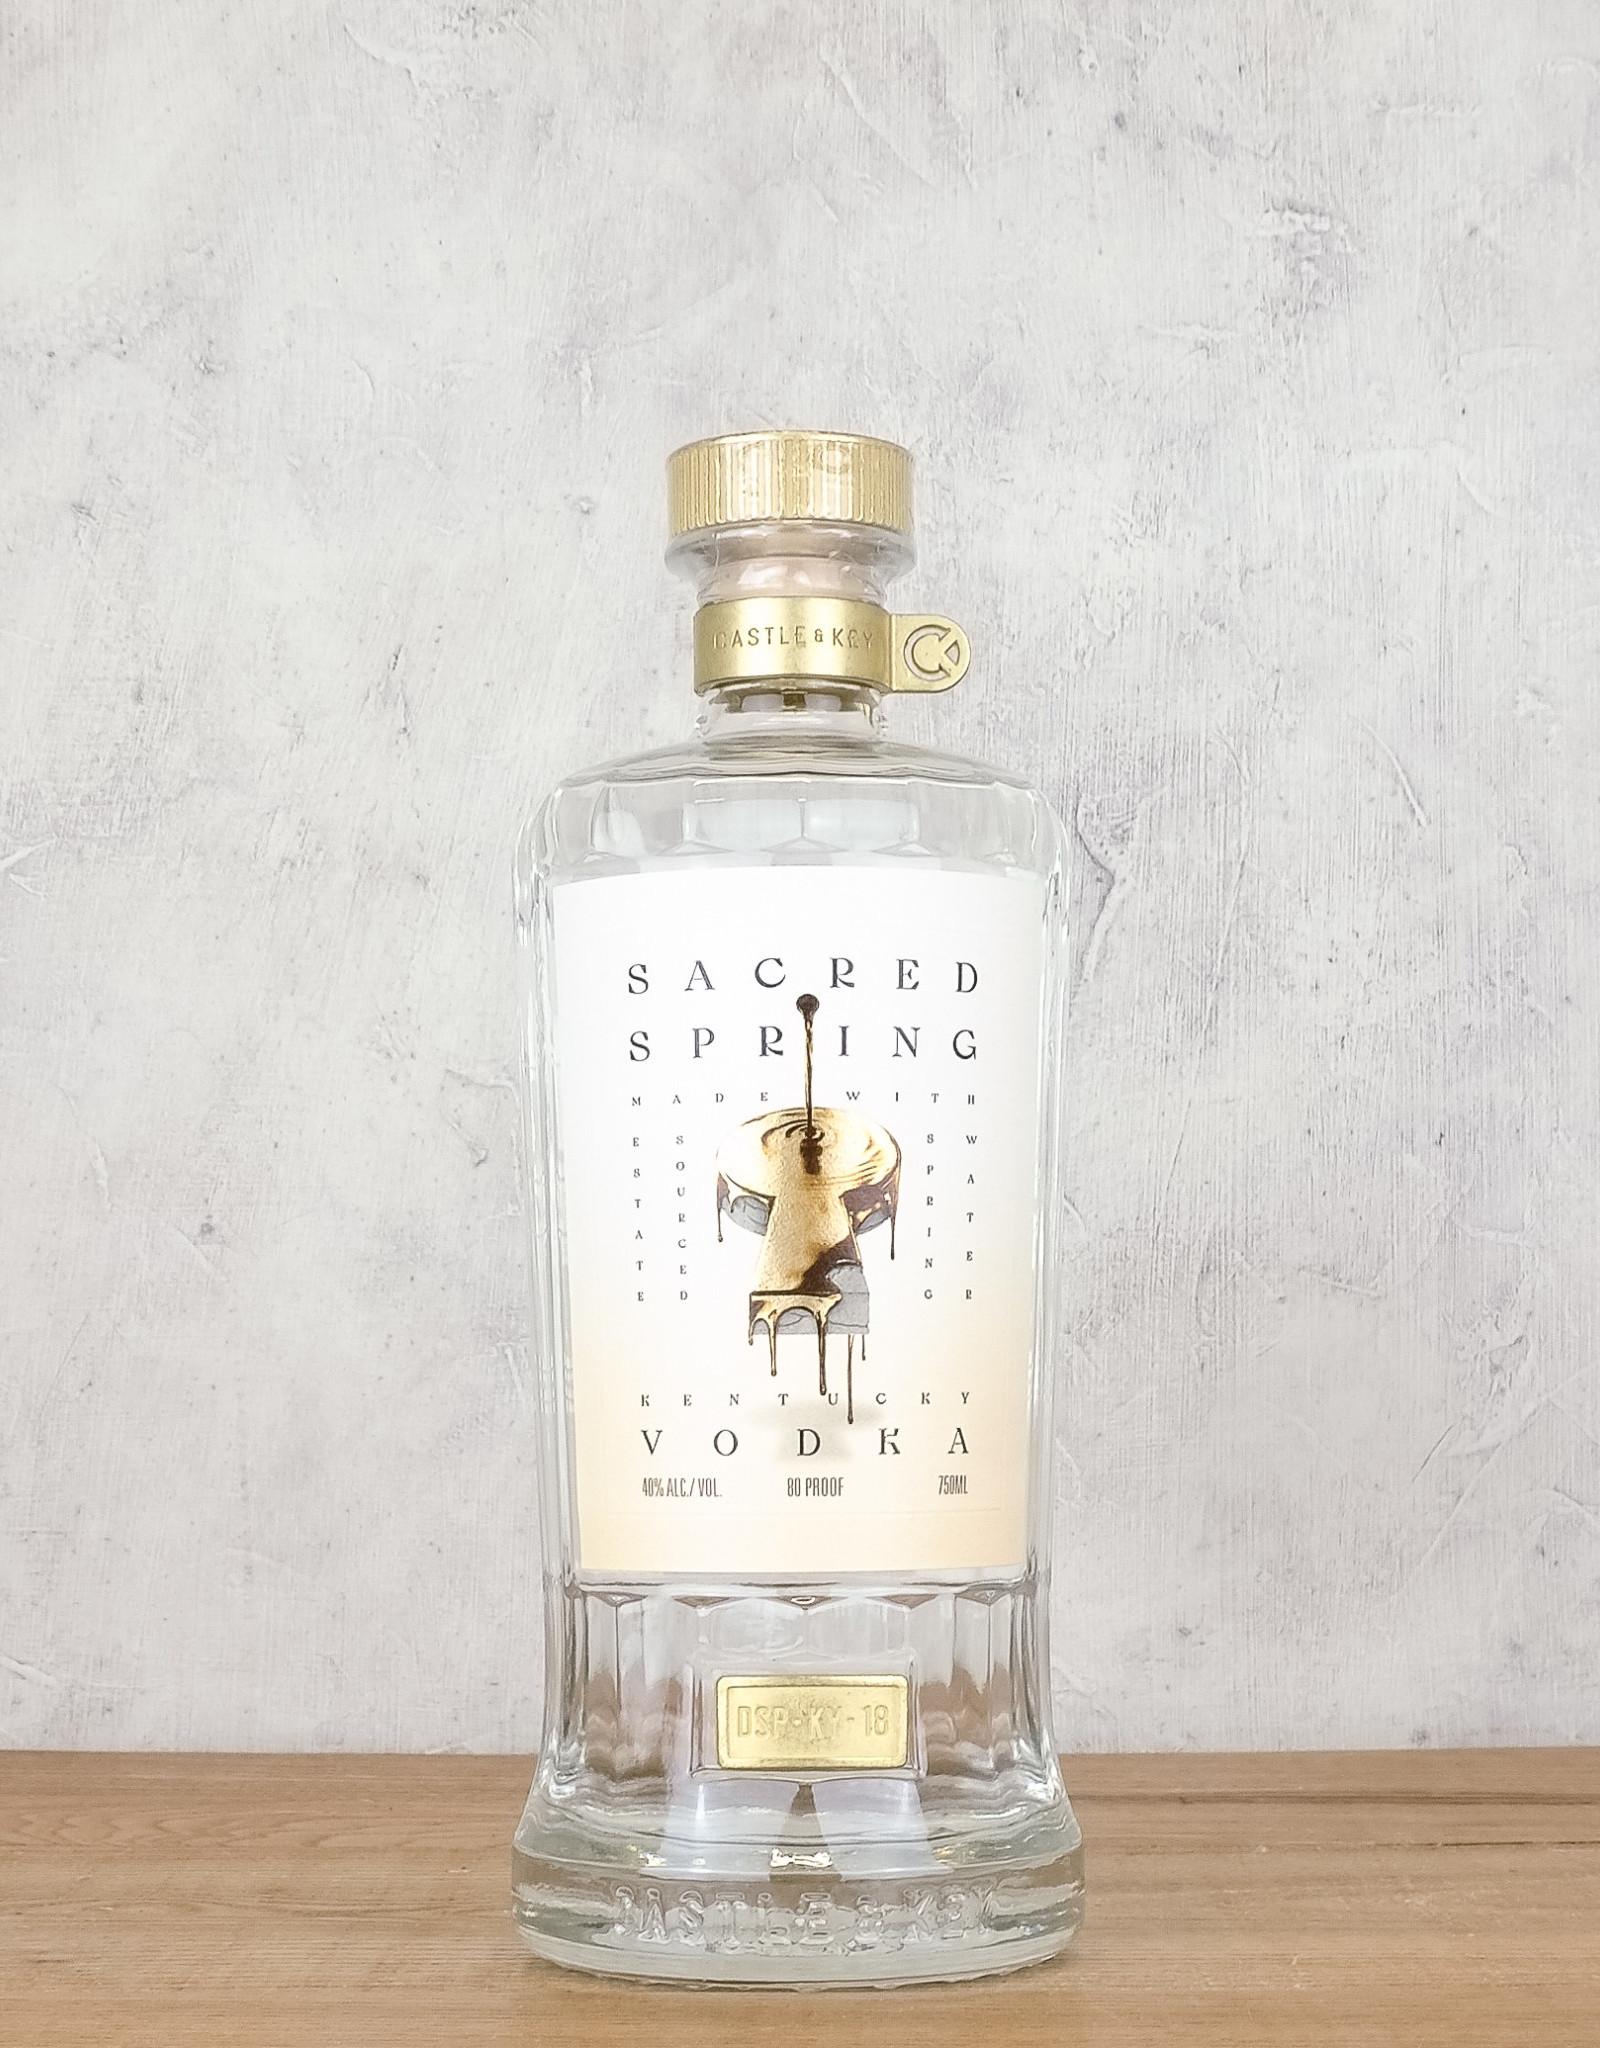 Castle & Key Vodka